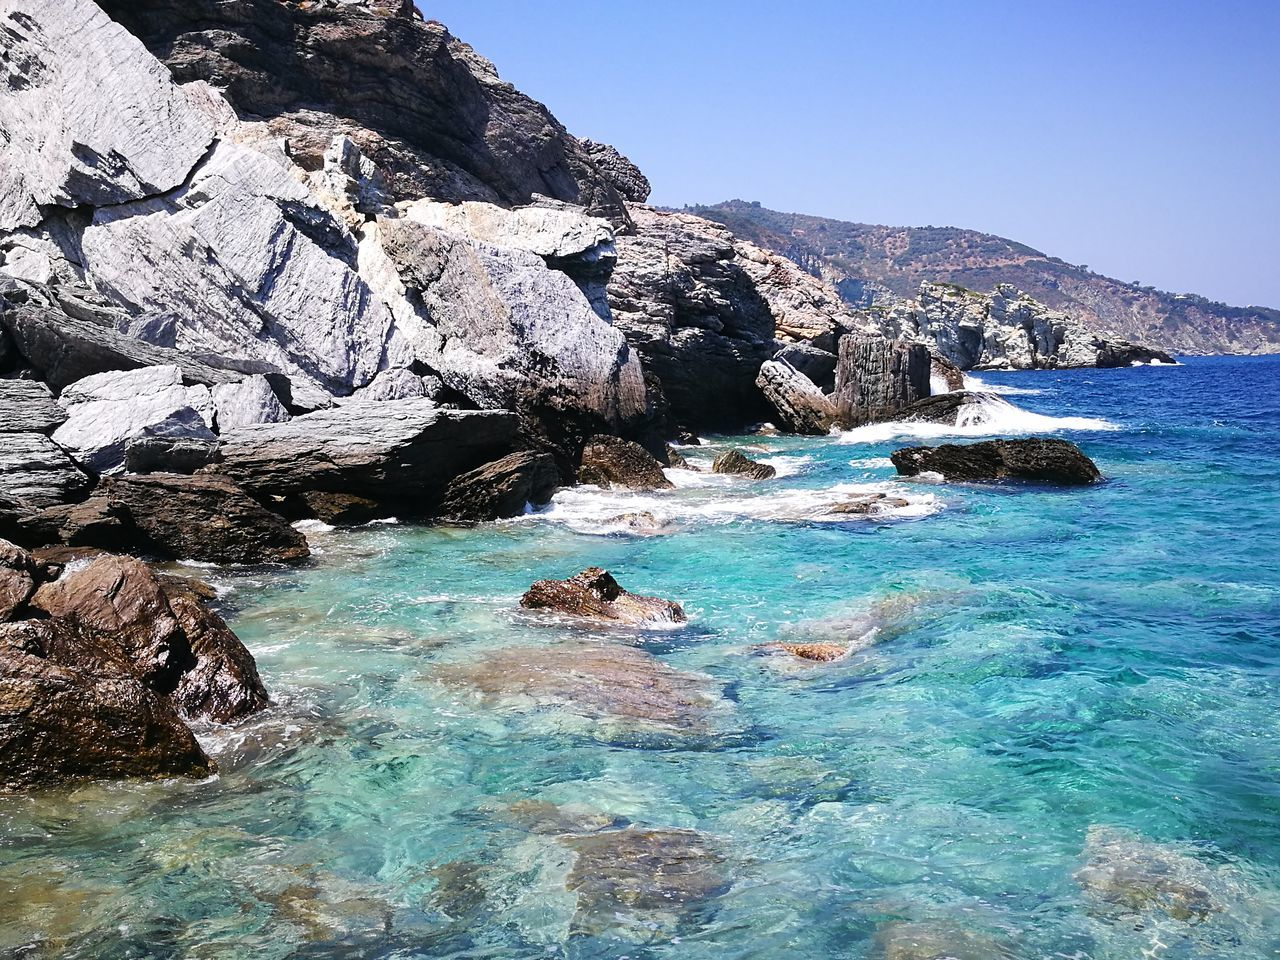 Skopelos Greek Island Mamma Mia Church Sea View Sea And Rocks Sporades Greece Greek Islands Greek Summer Island